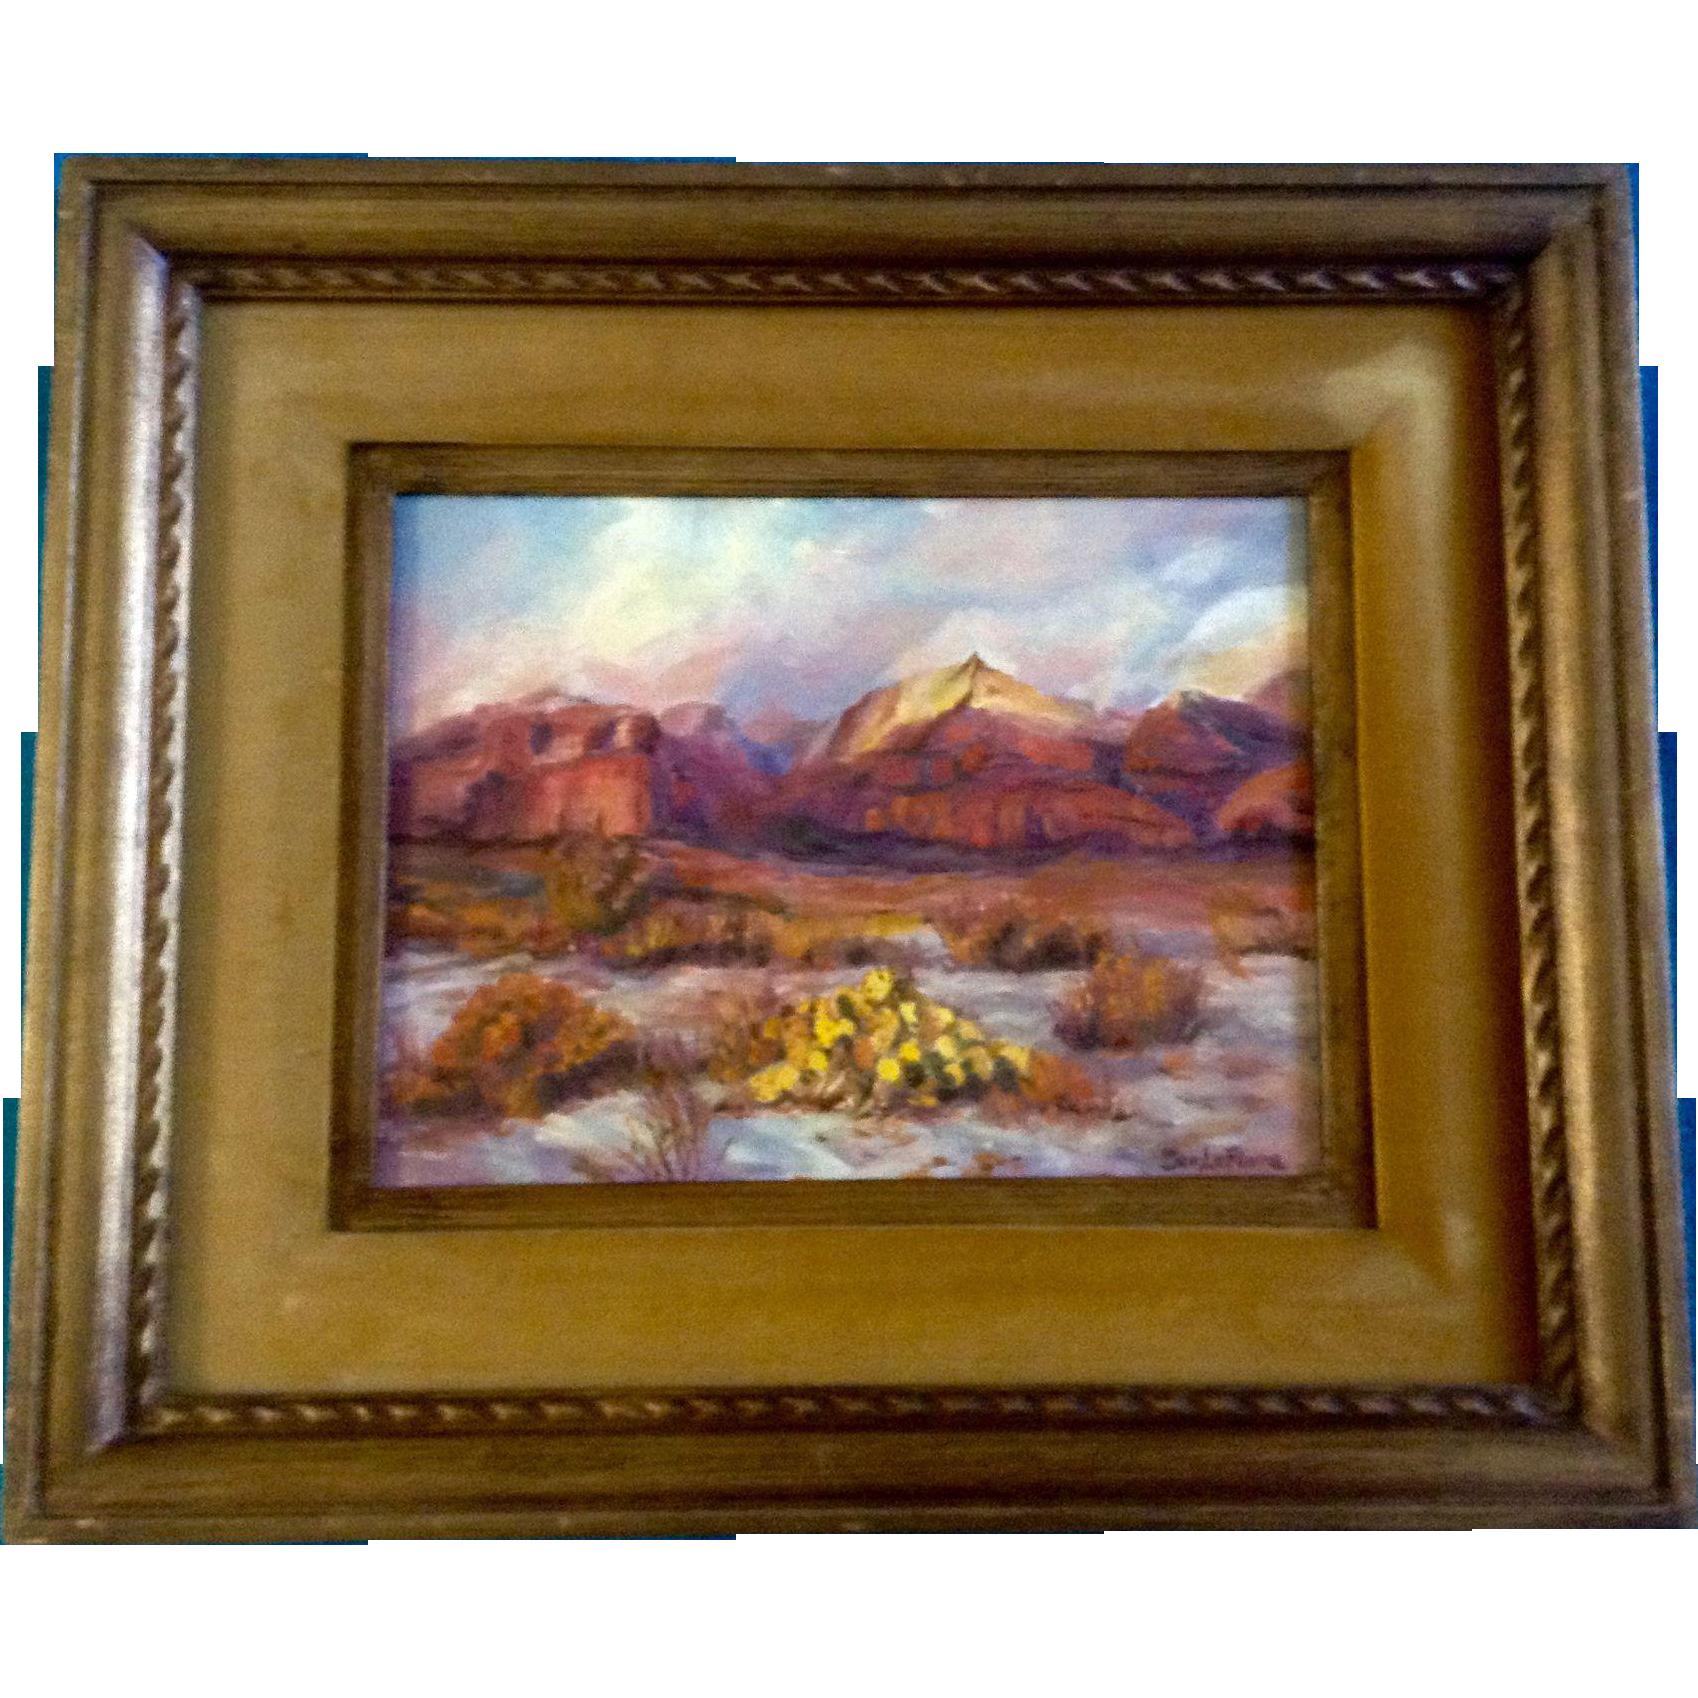 Dee Lefevre Oil Painting On Canvas Board Landscape